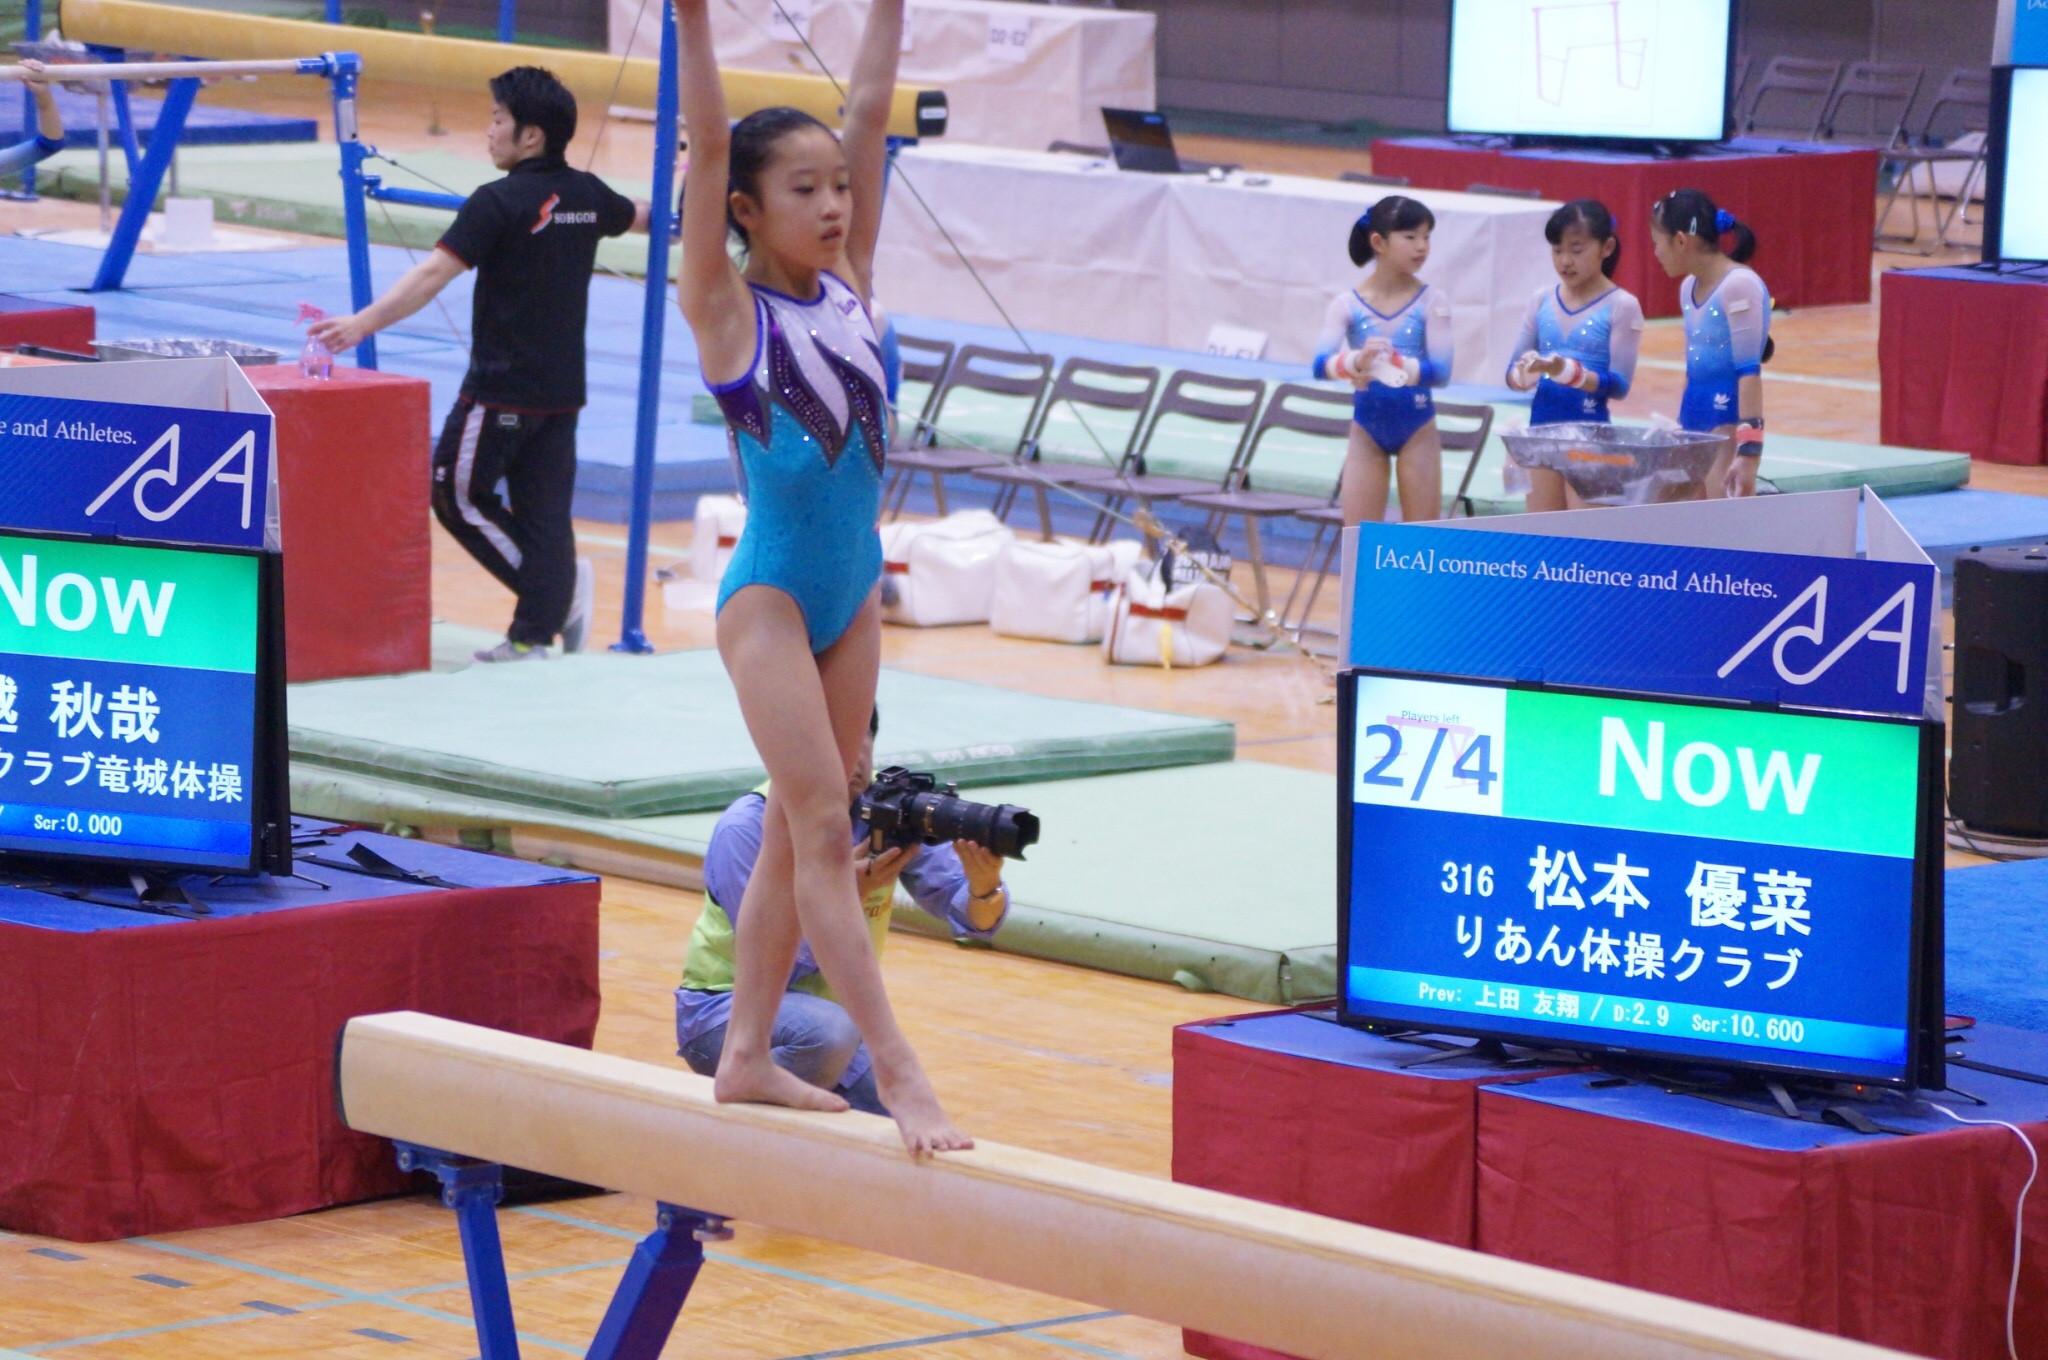 2019年AJG大会in三重県画像23